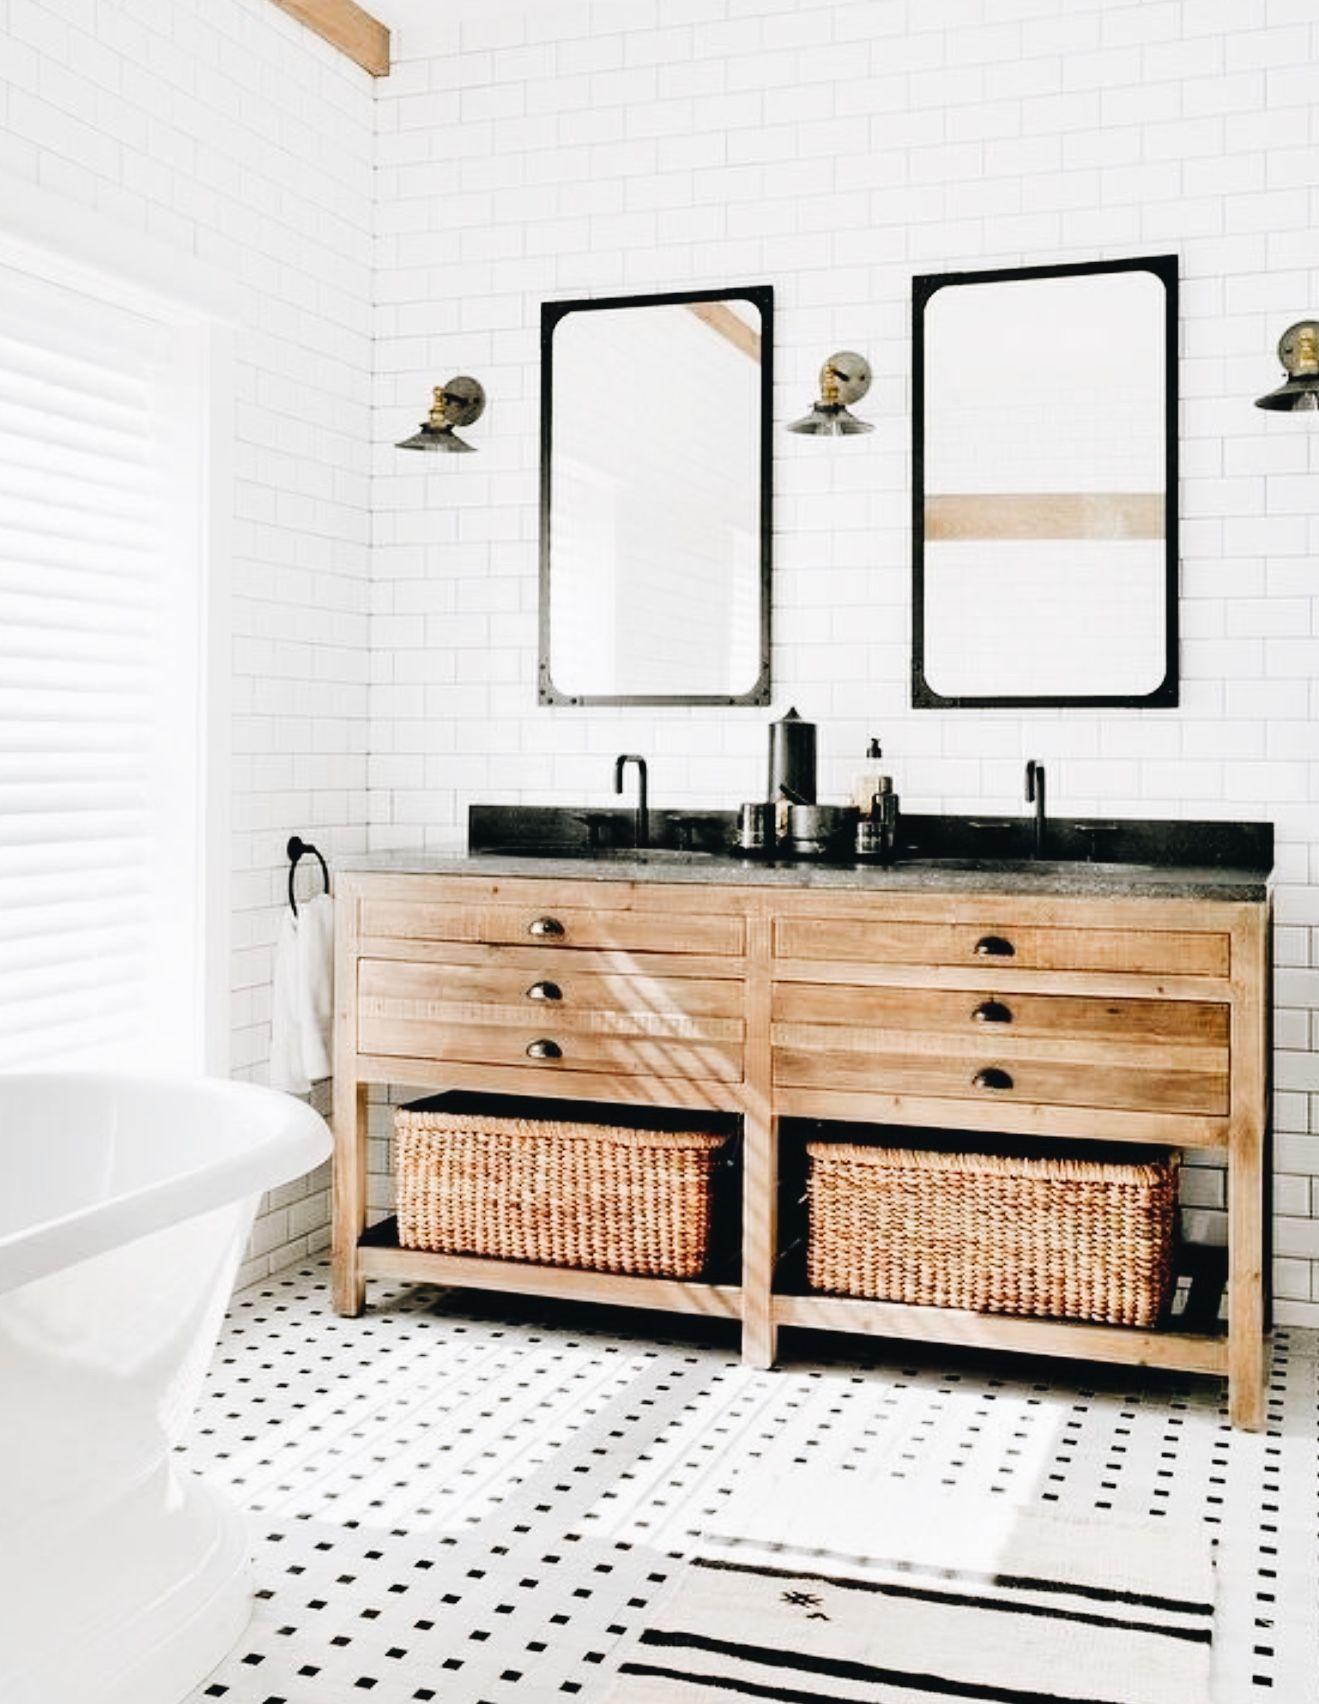 Salle De Bain Hipster ~ pin by julie deliry on salle de bain pinterest bath future and